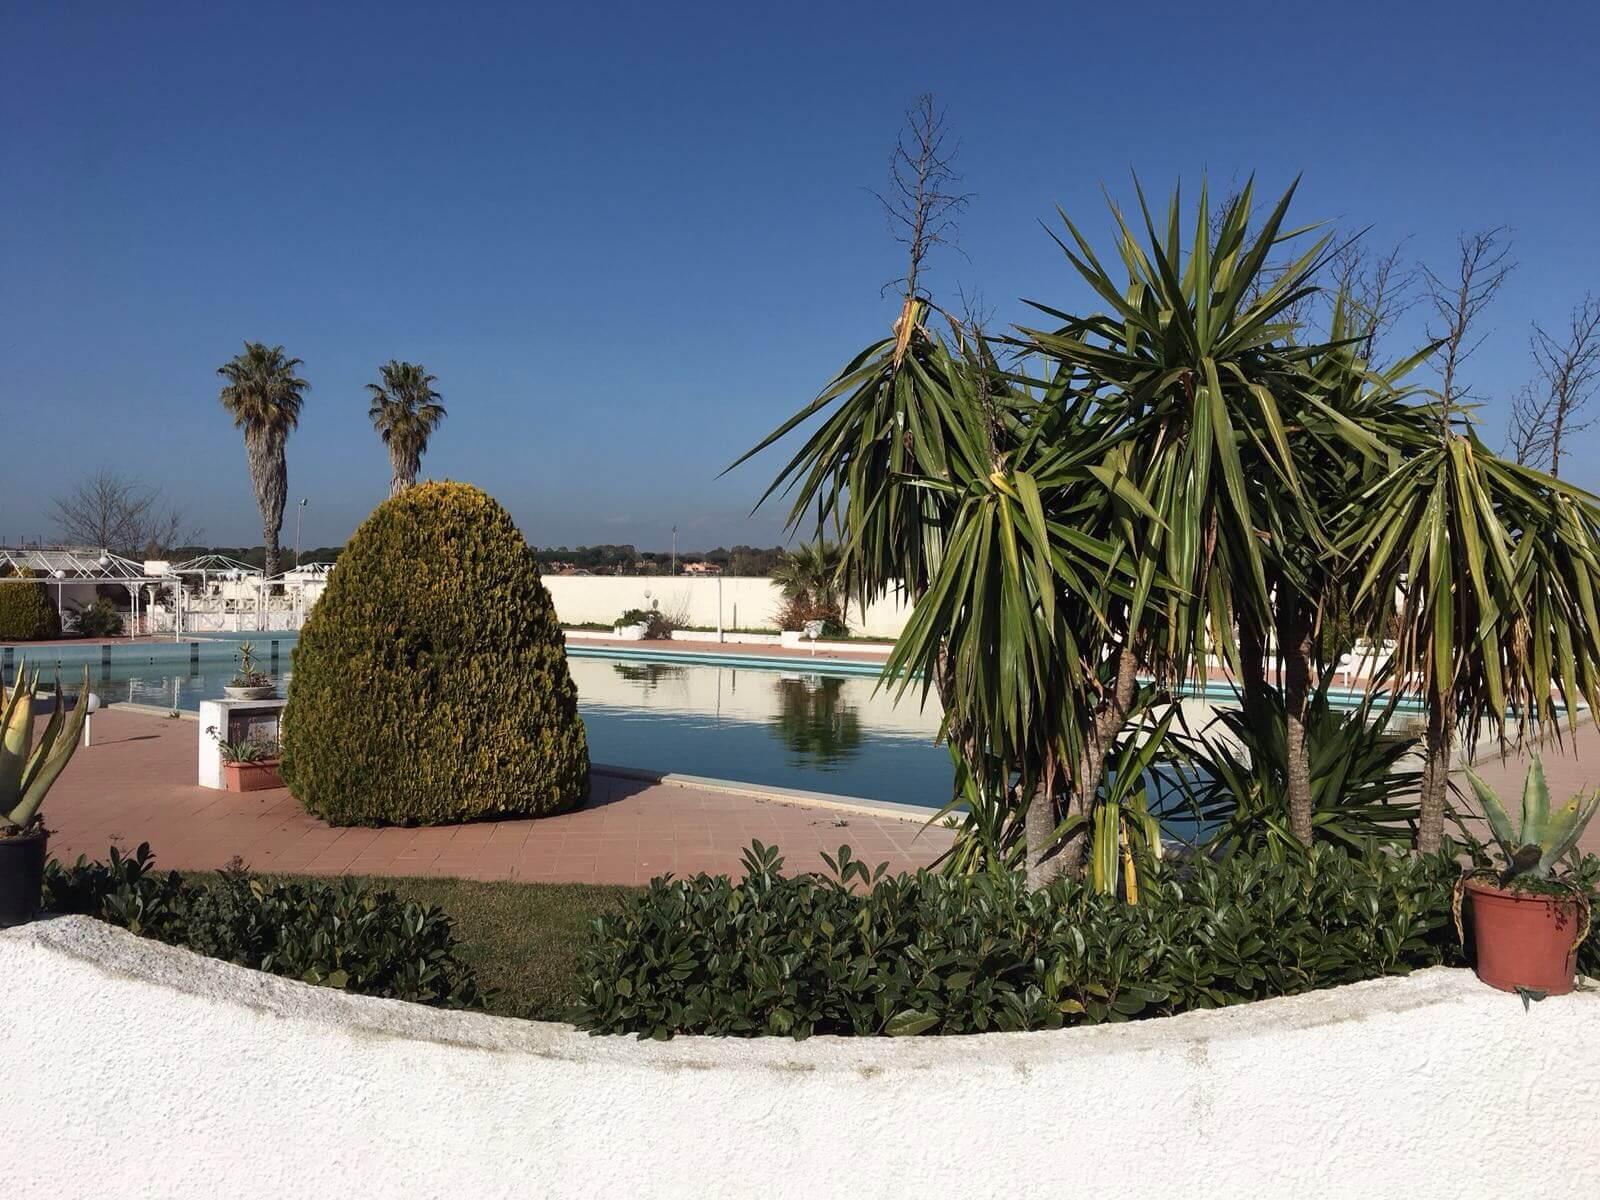 piscina con piante nel giardino